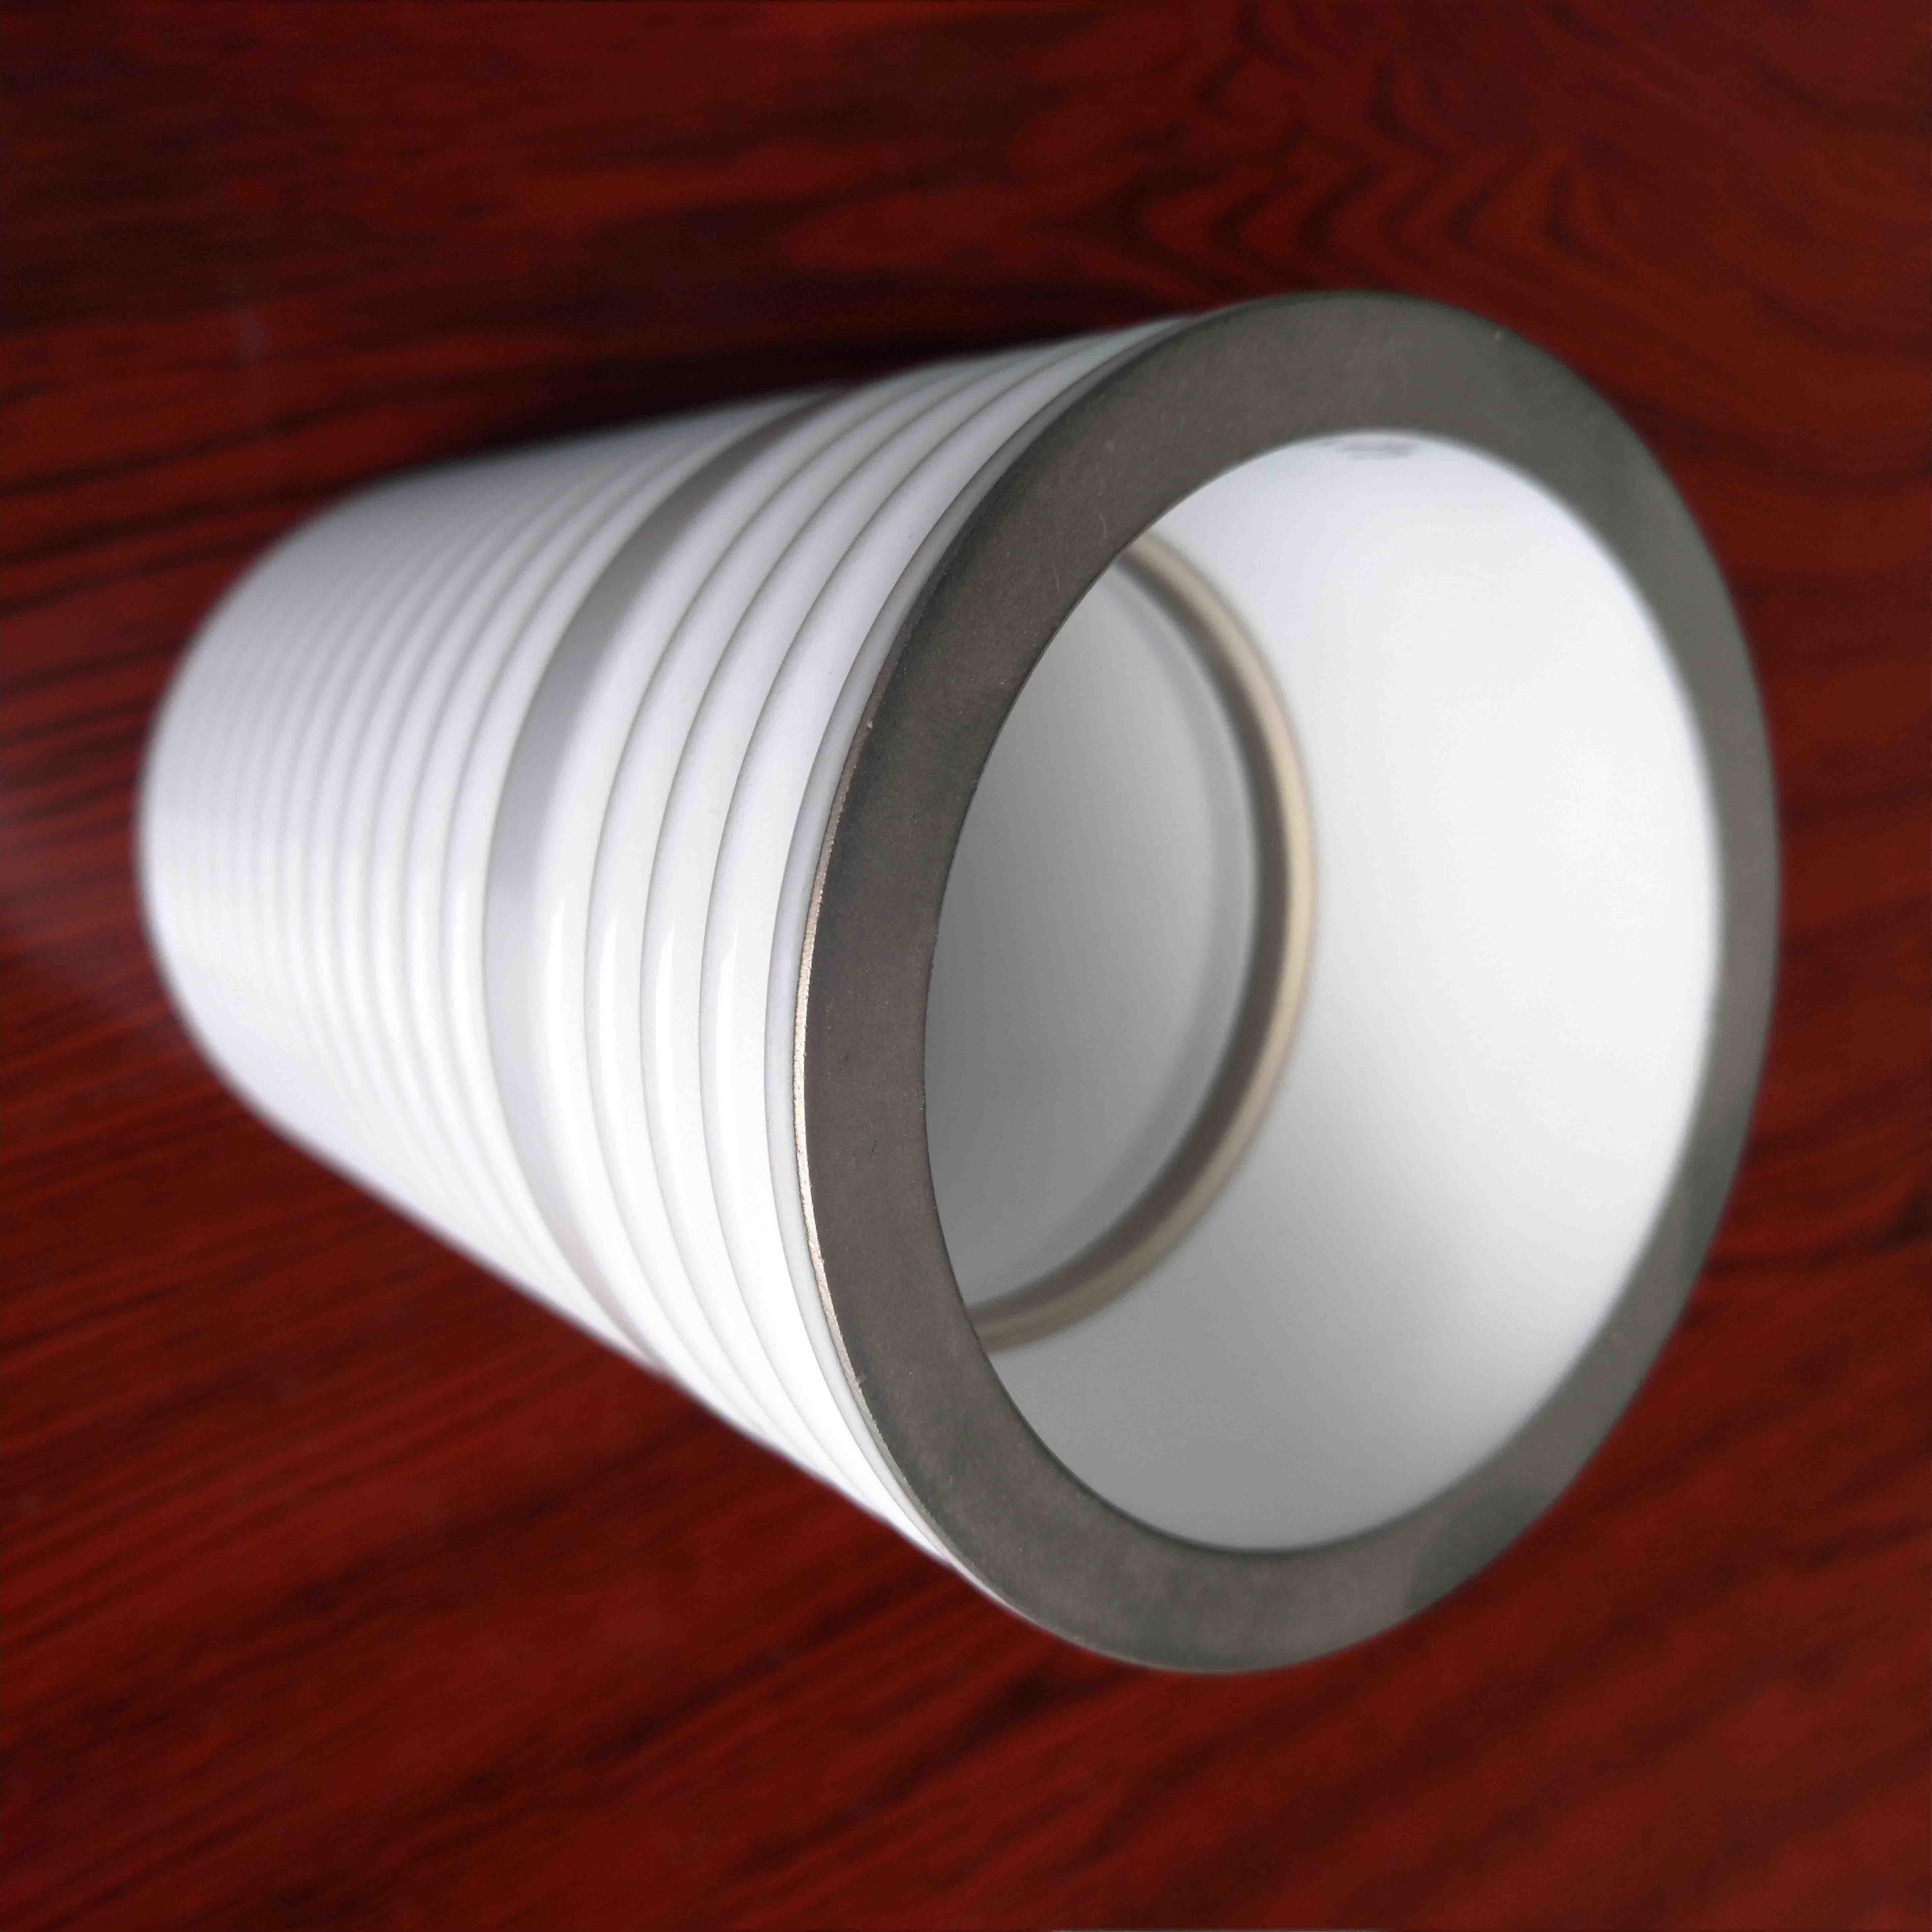 Metallized Alumina Ceramics-Vacuum Metallizing Service by SGJ-International (Shaanxi Sgj International Co., Ltd.)